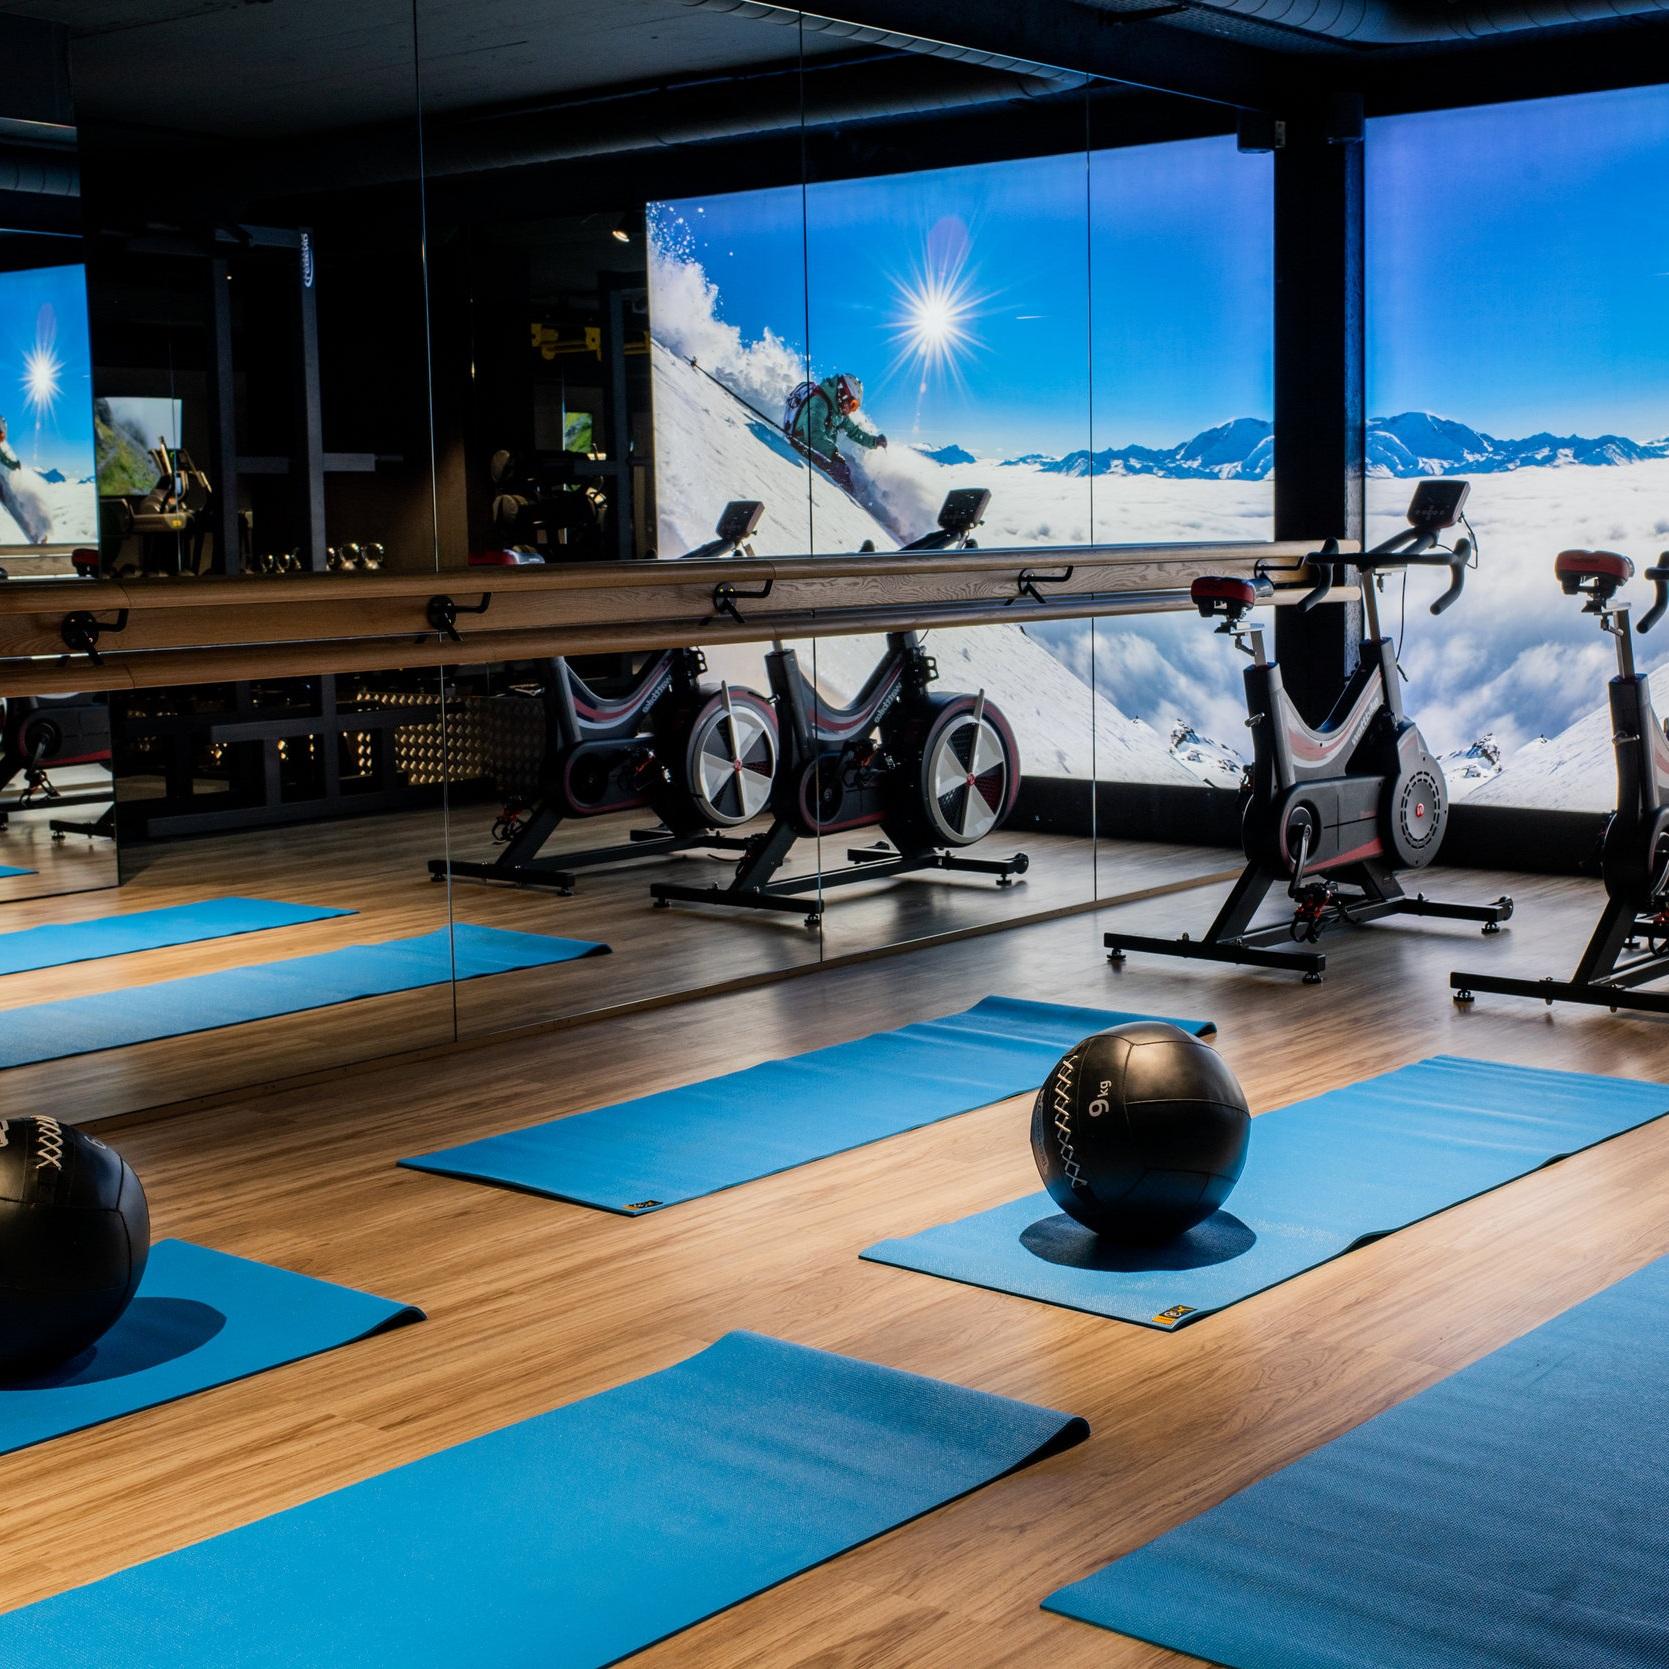 VieMontagne-Fitness-Alpimages%40verbier.ch-9813.jpg